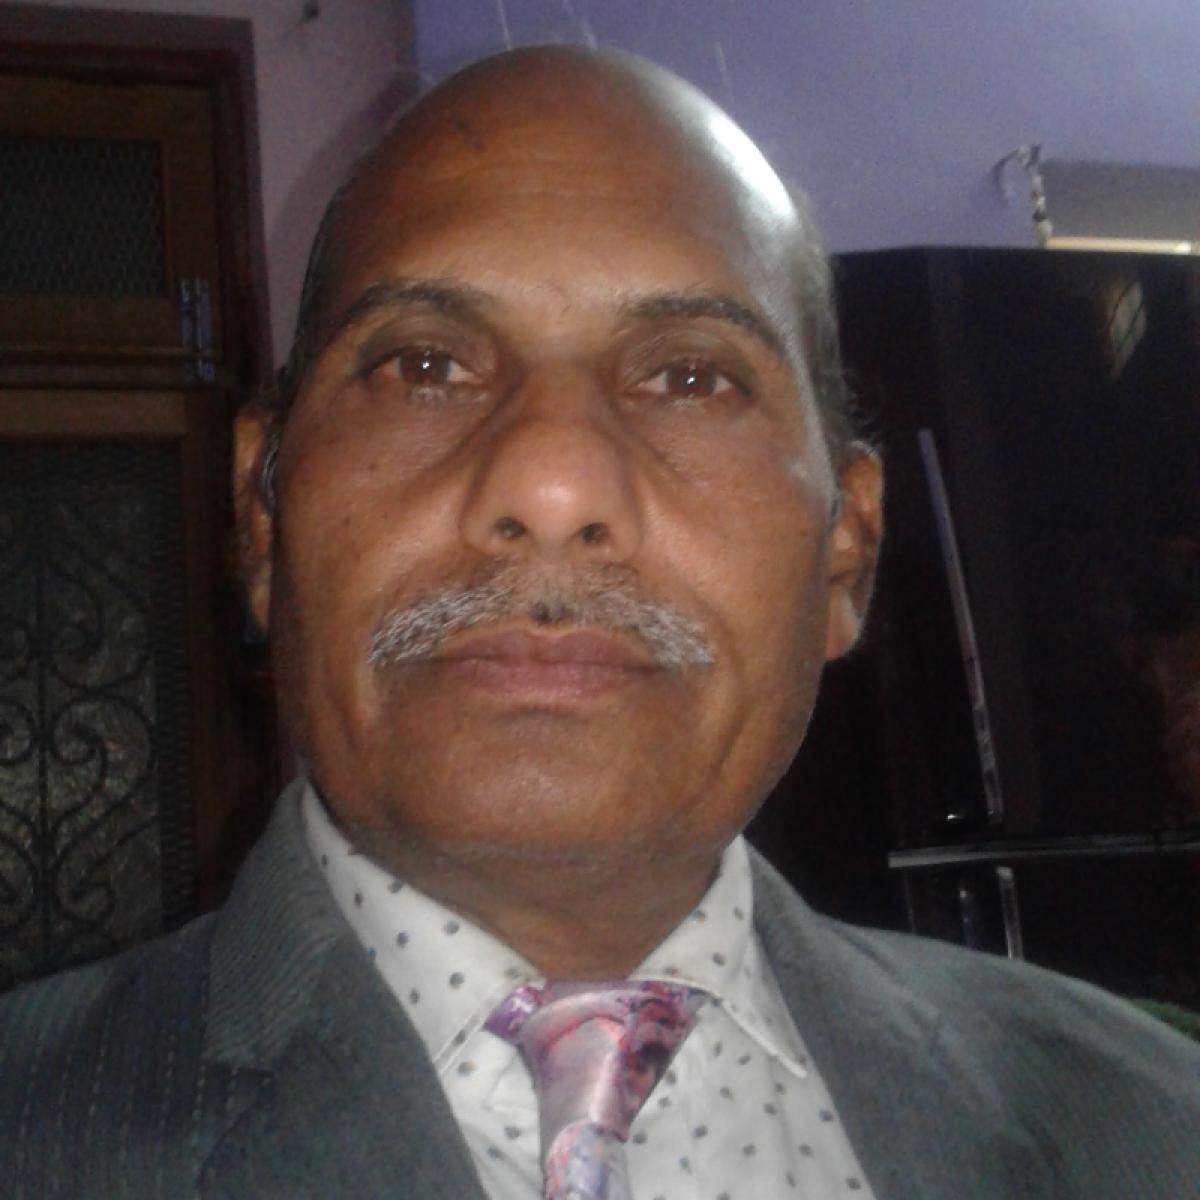 Ujjain: Corruption a hurdle in battle against corona